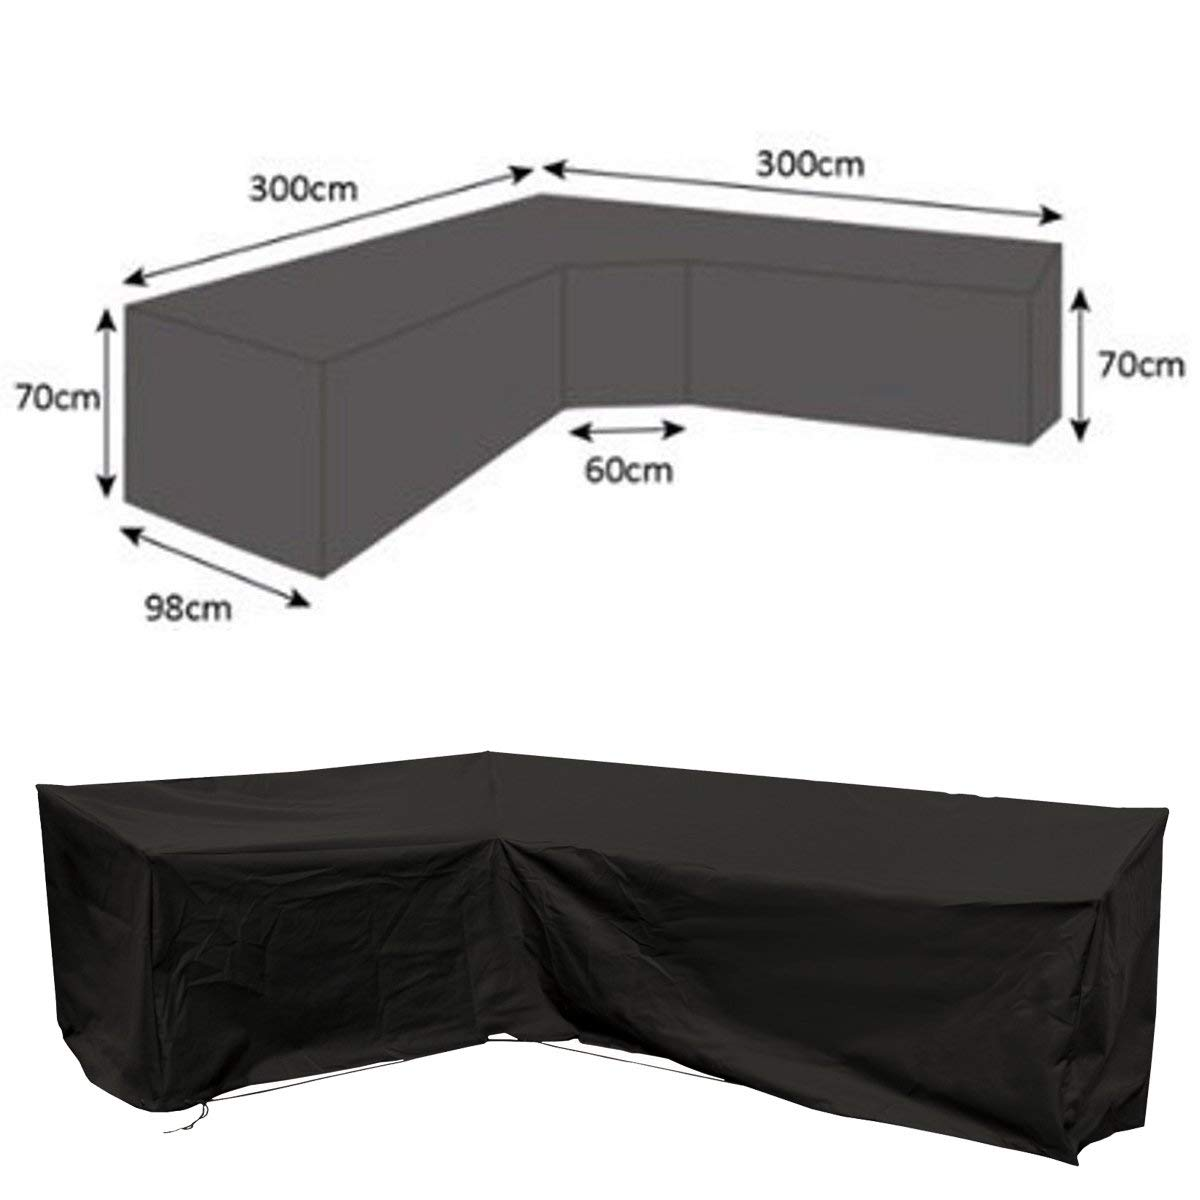 dDanke Black Universal L Shape Sofa Covers for Left Hand Waterproof & Dustproof Furniture Outdoor Outside Cover, 118.11'' x 118.11'' x 38.58'' x 27.56''